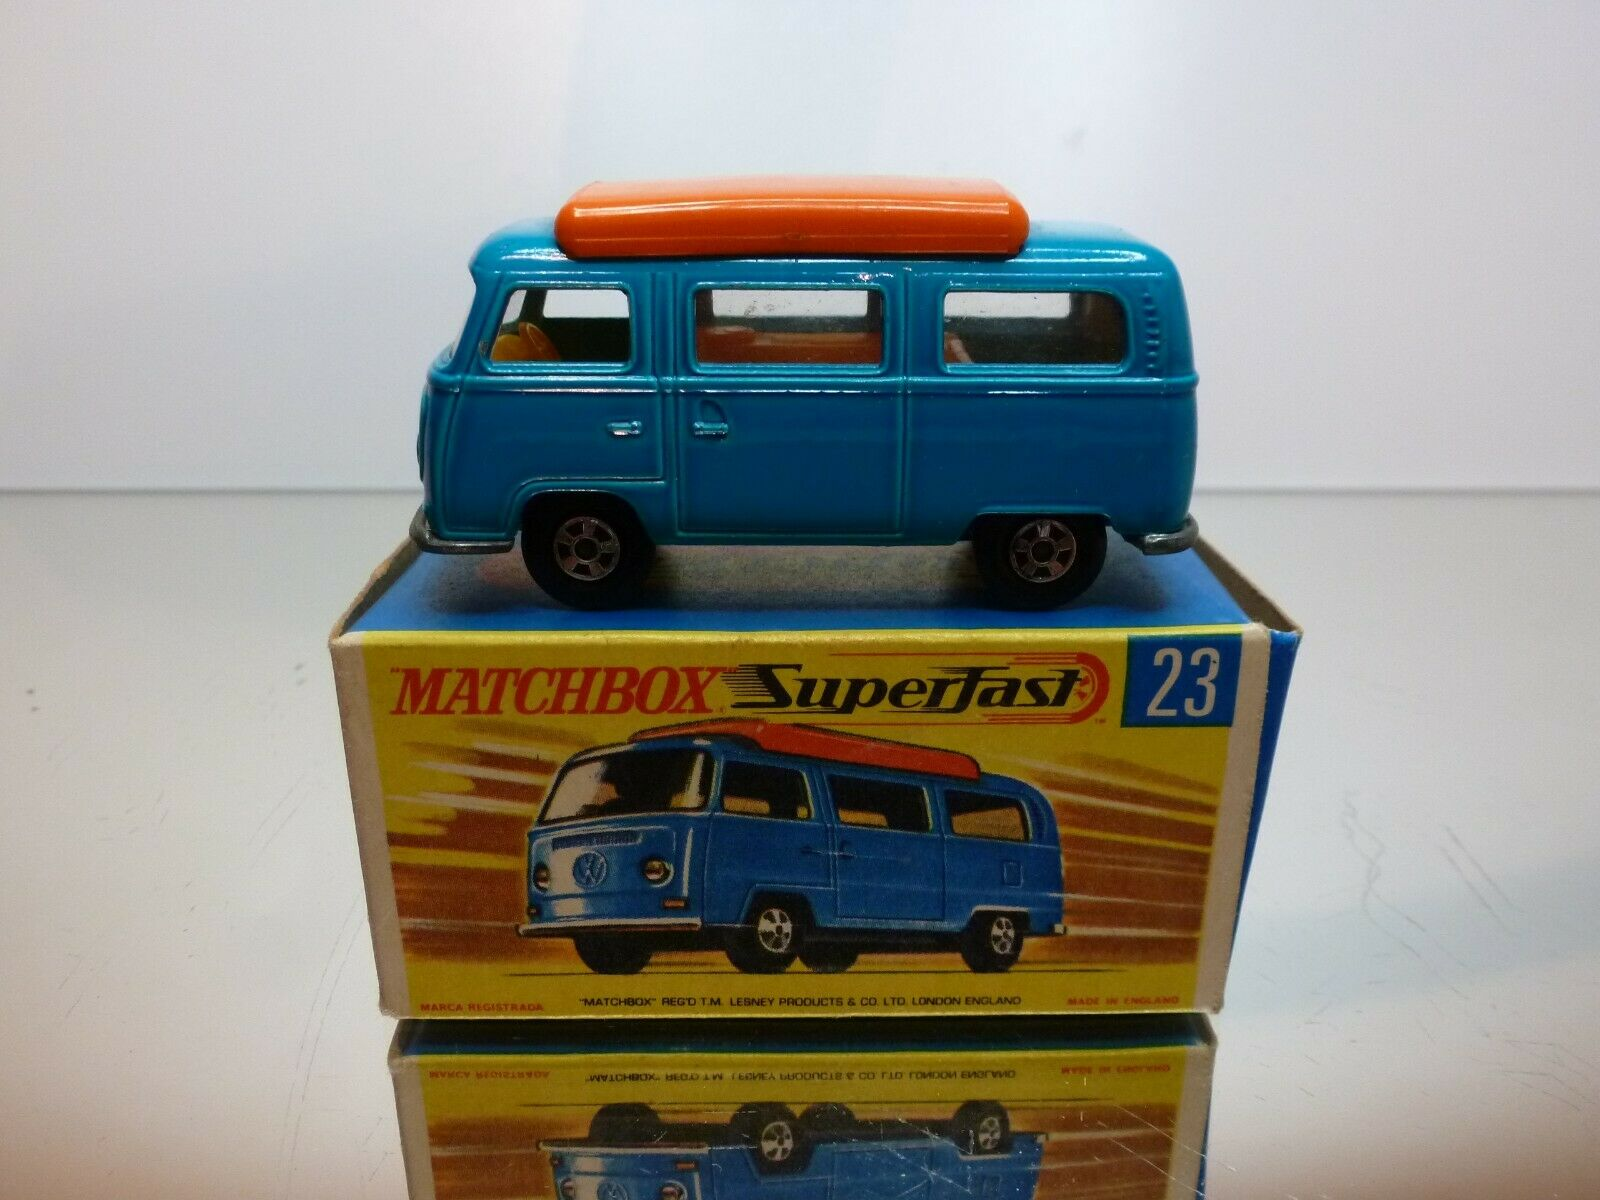 MATCHBOX 23 VW VOLKSWAGEN T2 CAMPER - bleu - EXCELLENT CONDITION IN BOX